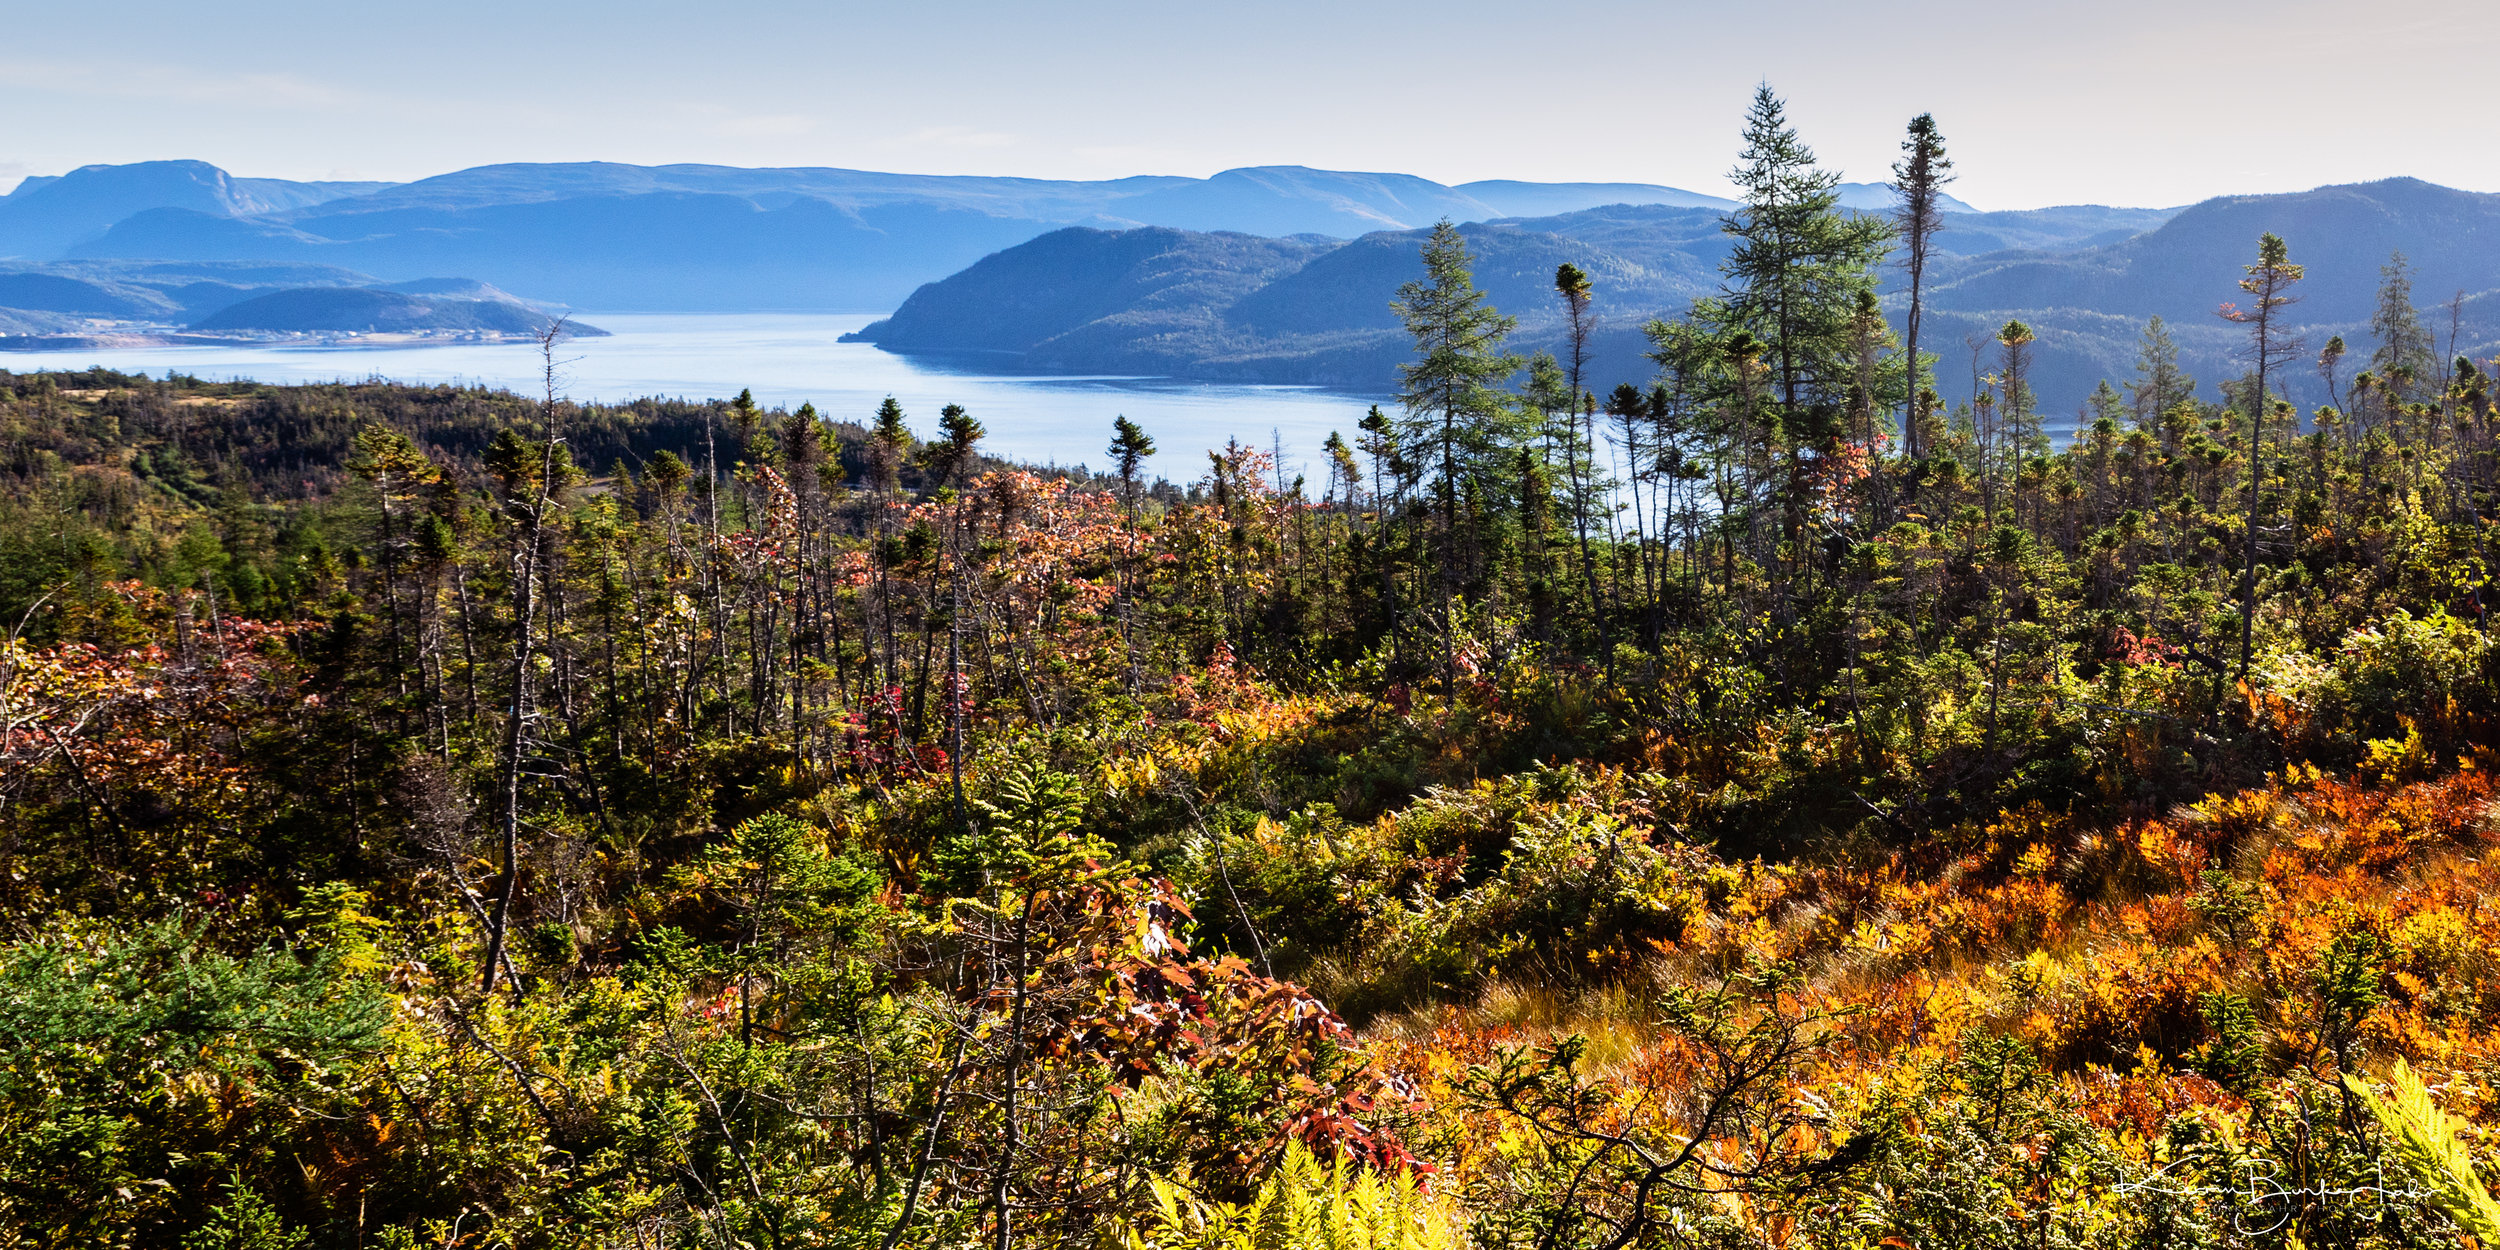 Gros-Morne-National-Park-Newfoundland-9-18-2017-2.jpg